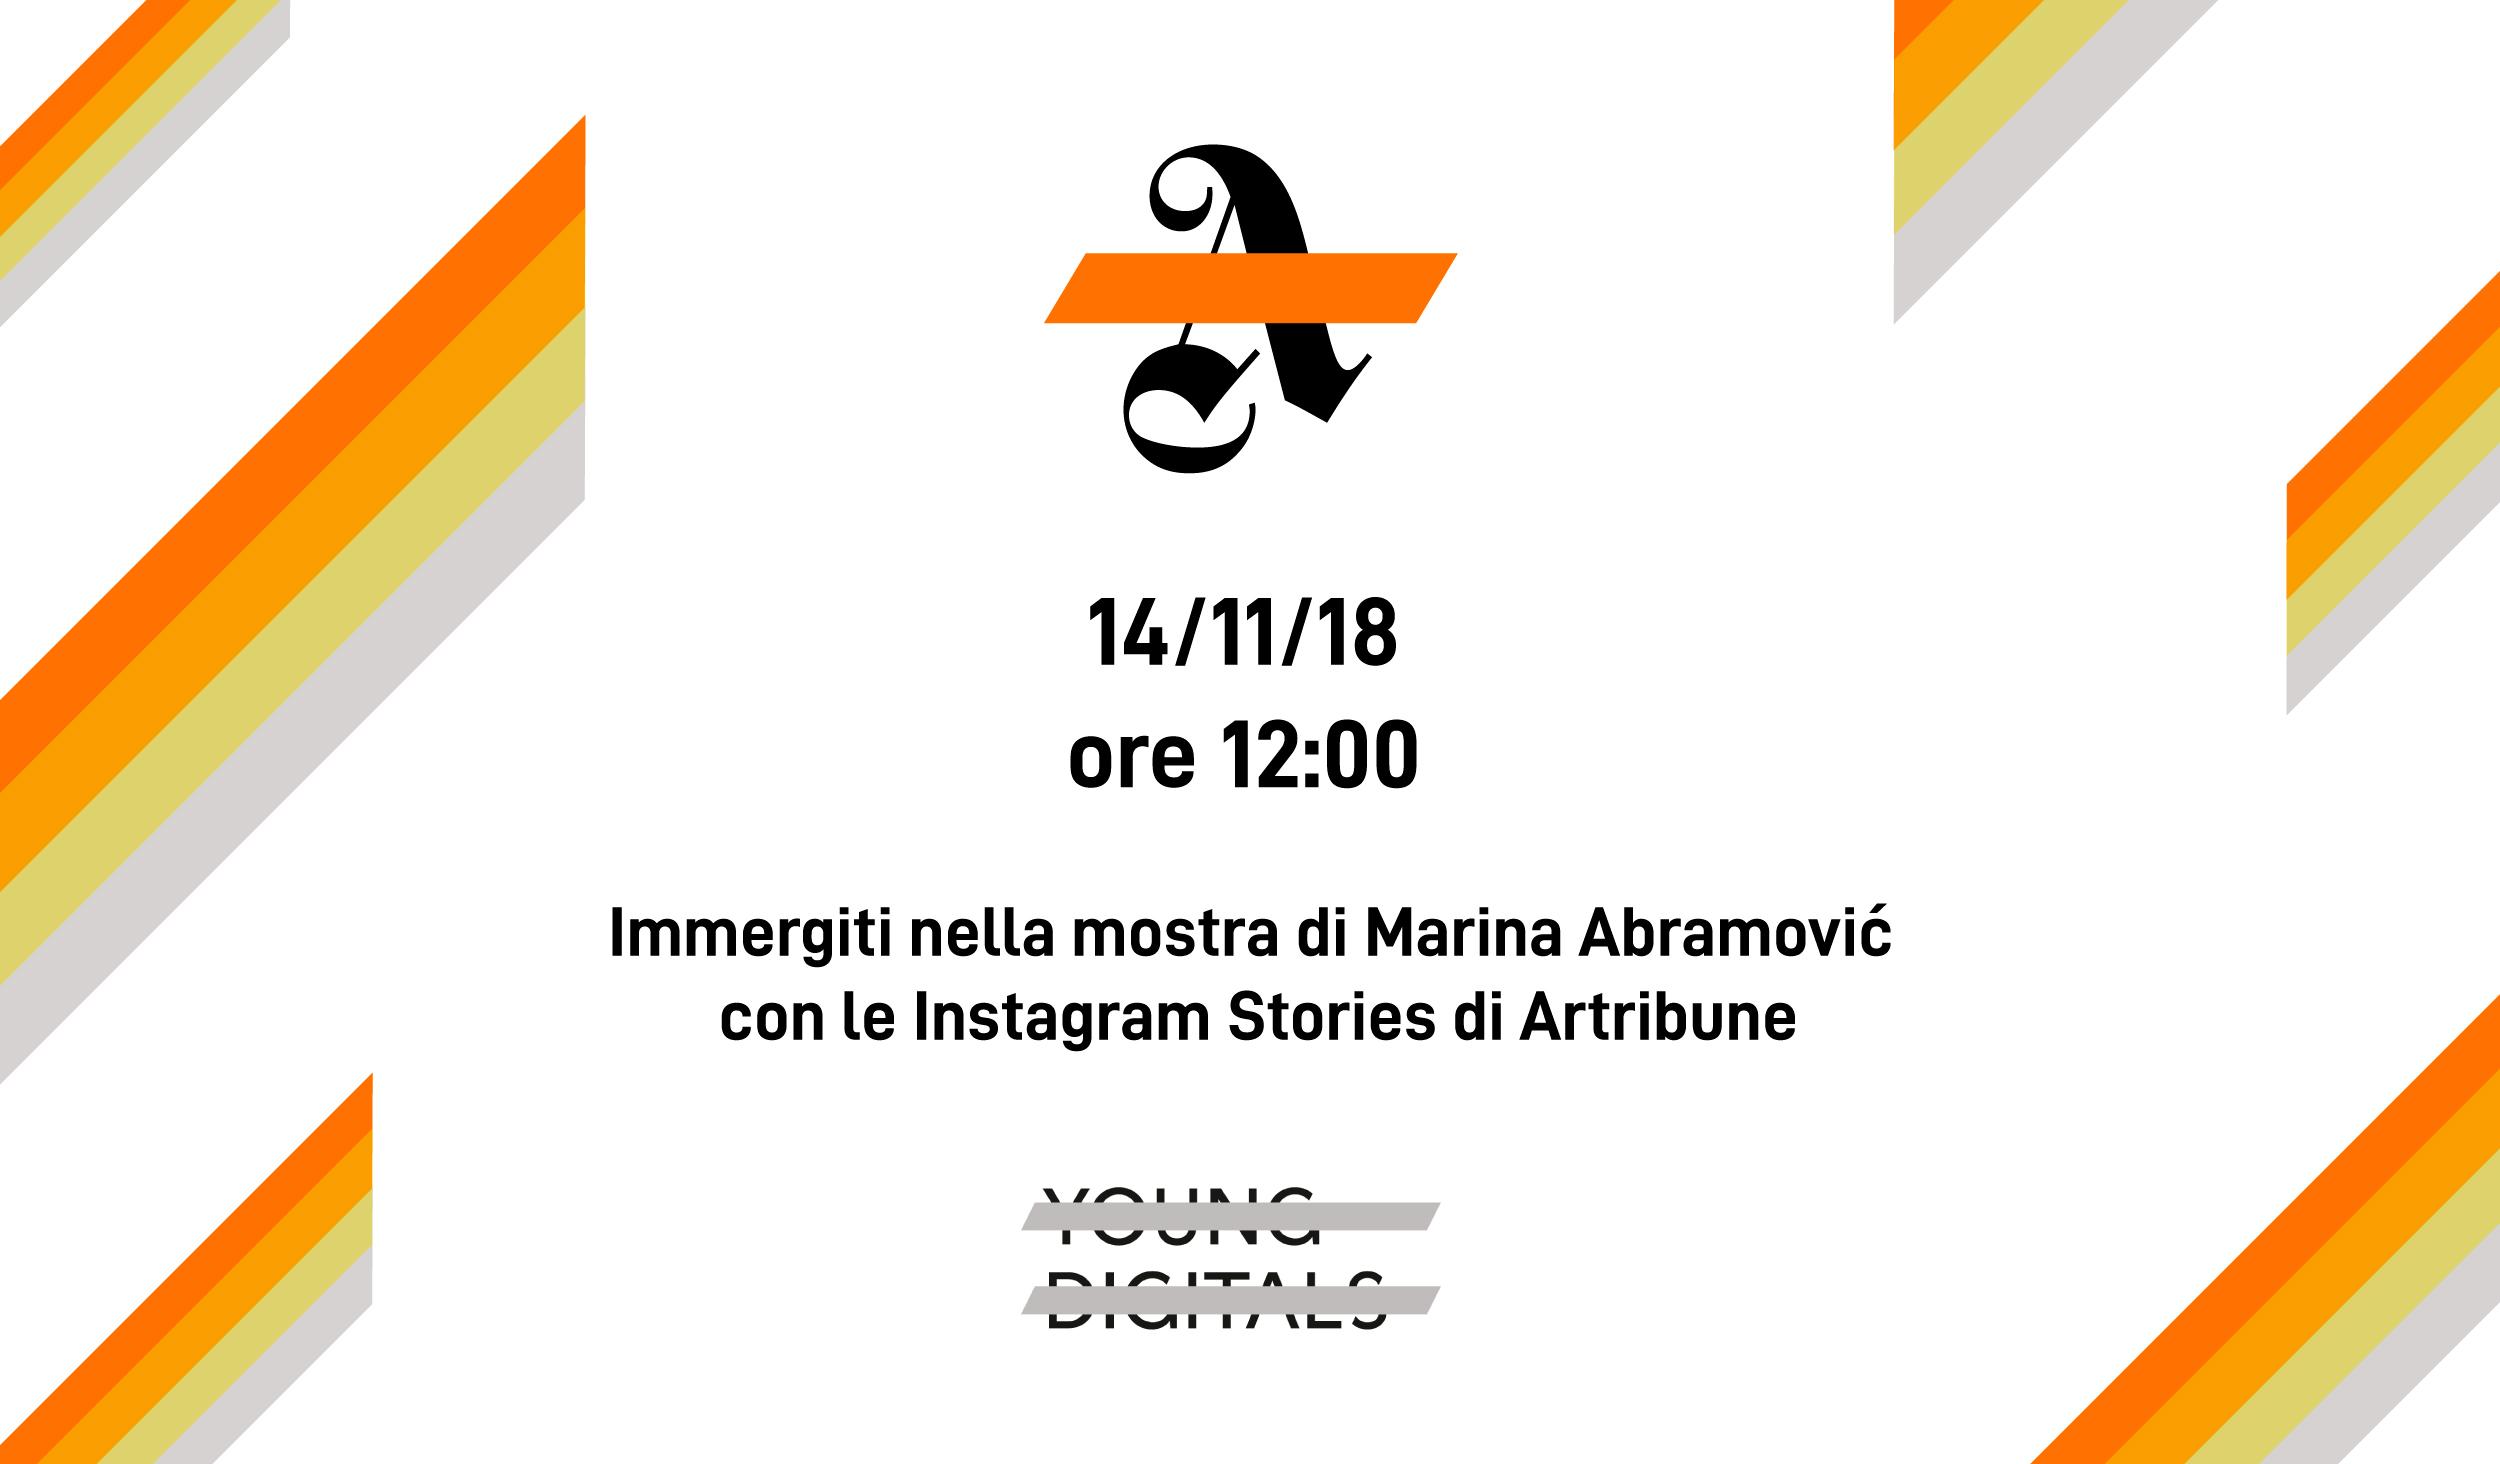 Young Digitals collabora con Artribune